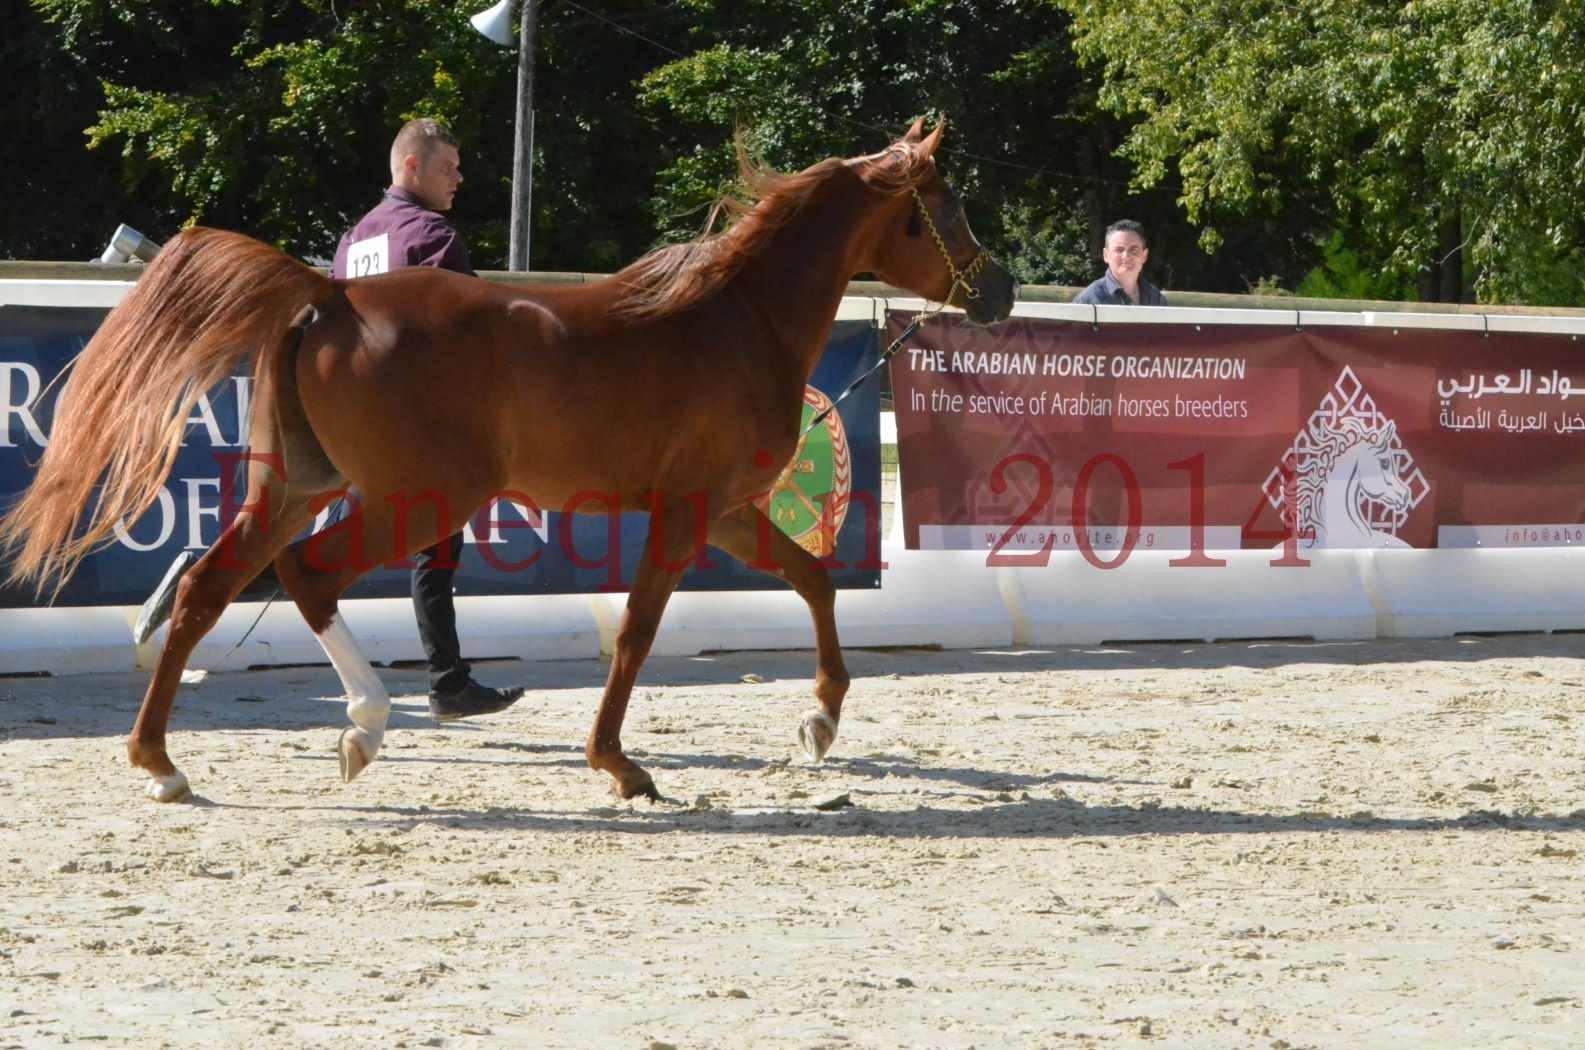 Championnat de FRANCE 2014 - Amateurs - SELECTO IBN SAMAWI - 013